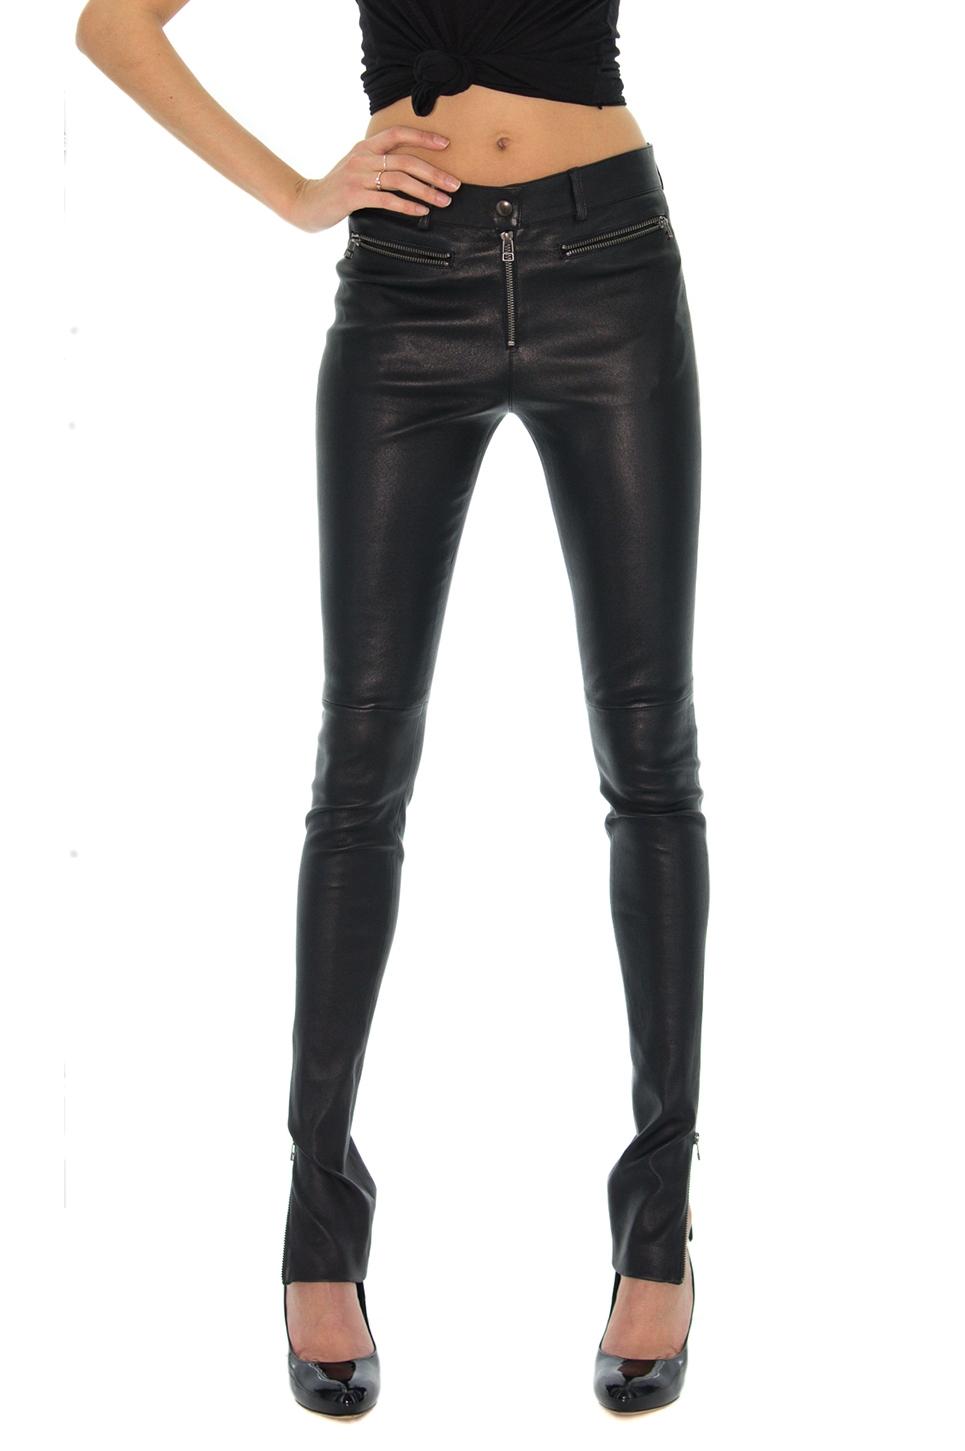 pantalon slim cuir femme jusqu 88 soldes premi re d marque. Black Bedroom Furniture Sets. Home Design Ideas